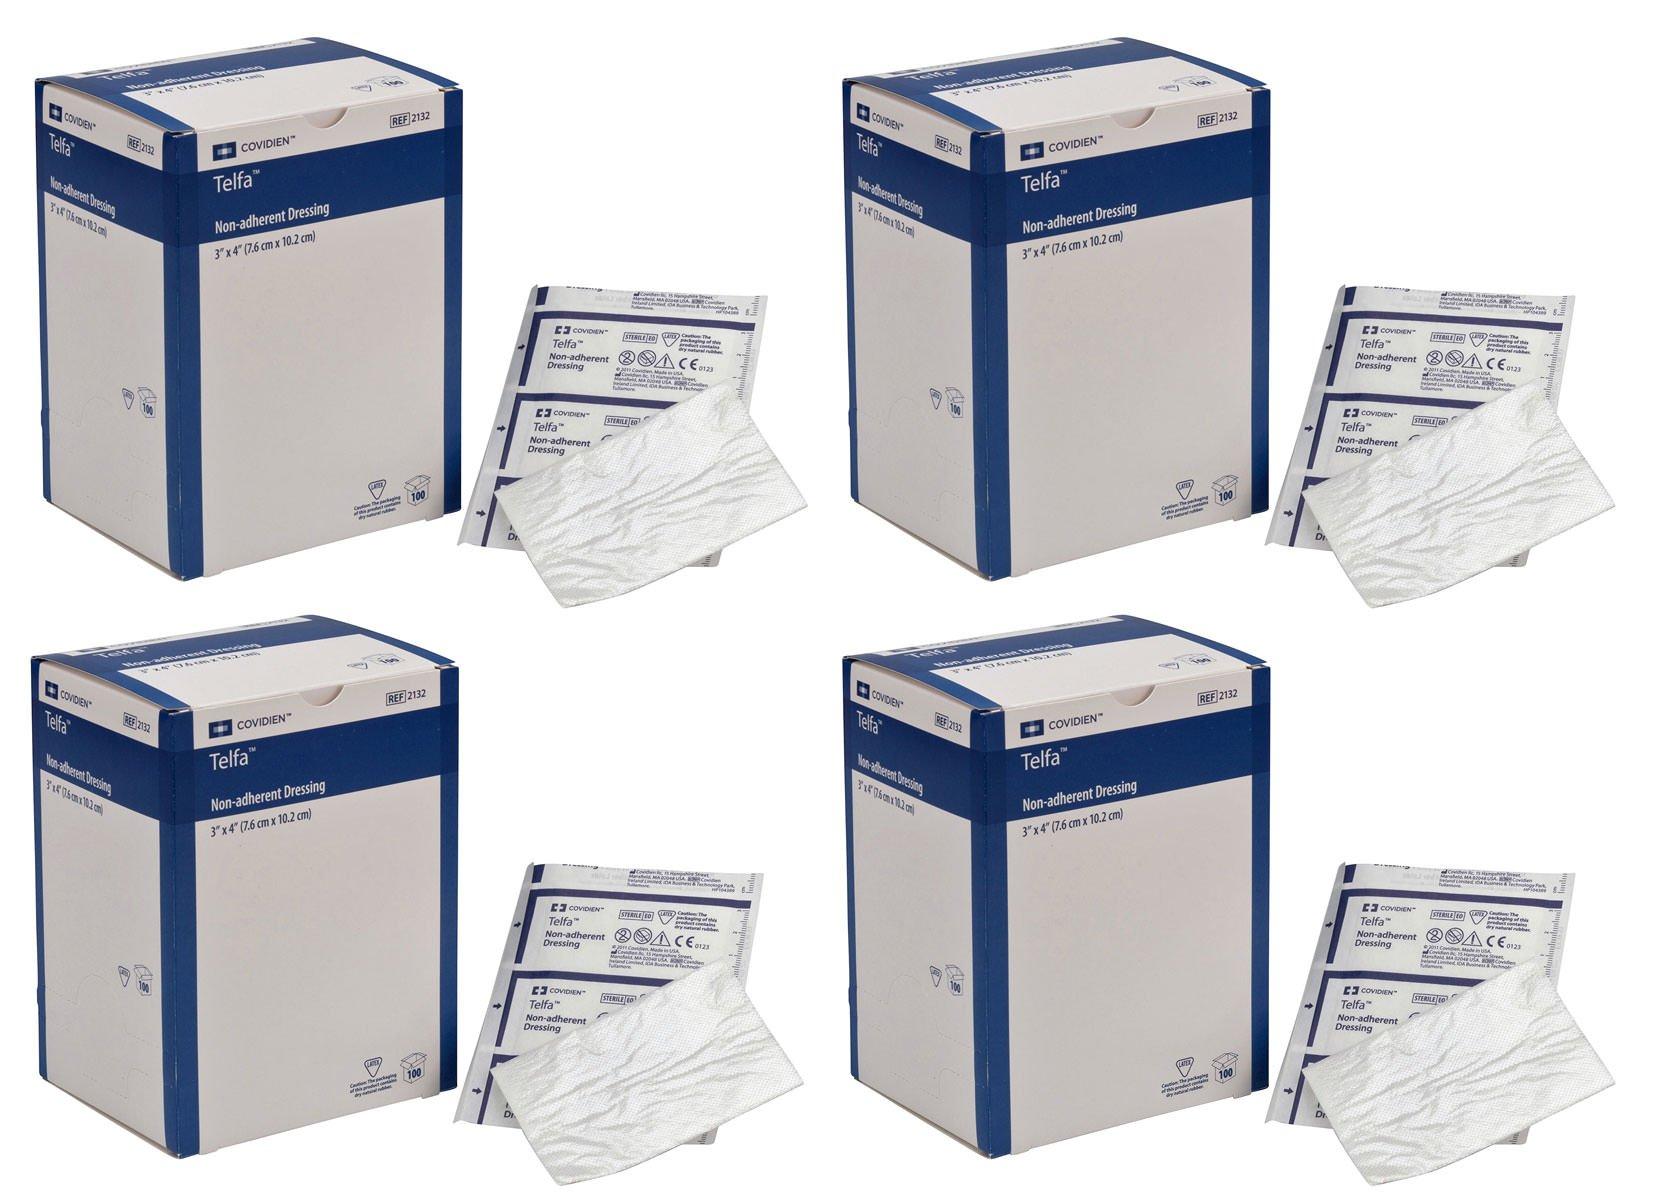 COVIDIEN SLDLJLFS 2132 Telfa Non-Adherent Dressing, 3'' x 4'' (Pack of 100) (4 Pack)